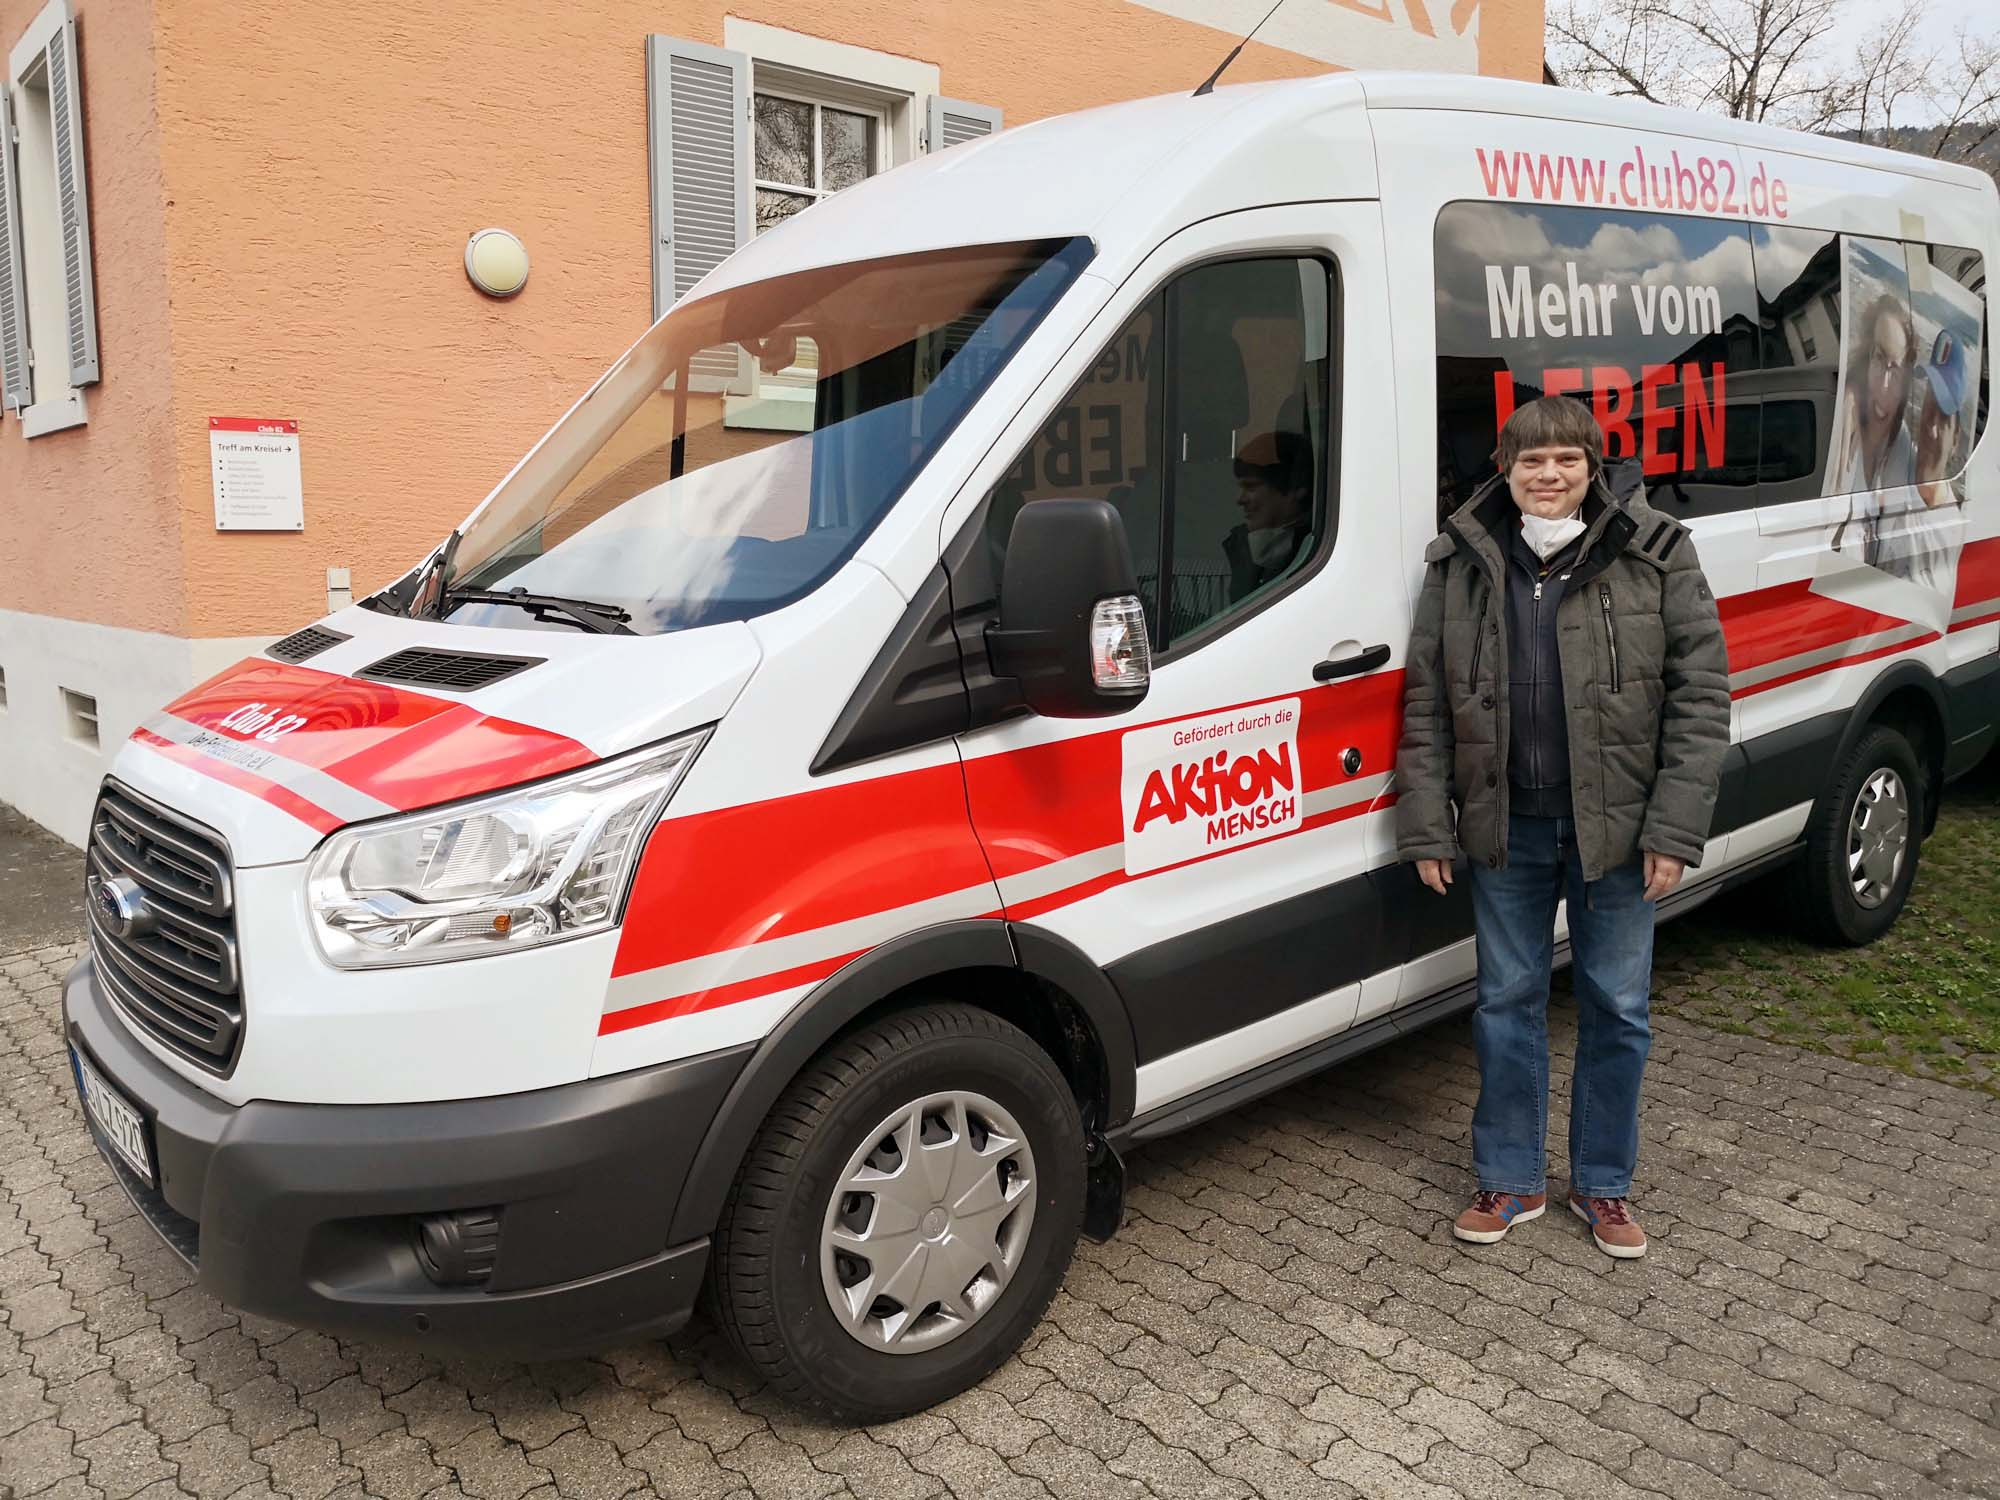 2021-4-23-HA-Club 82- Kleinbus Aktion Mensch 000-004-058-001